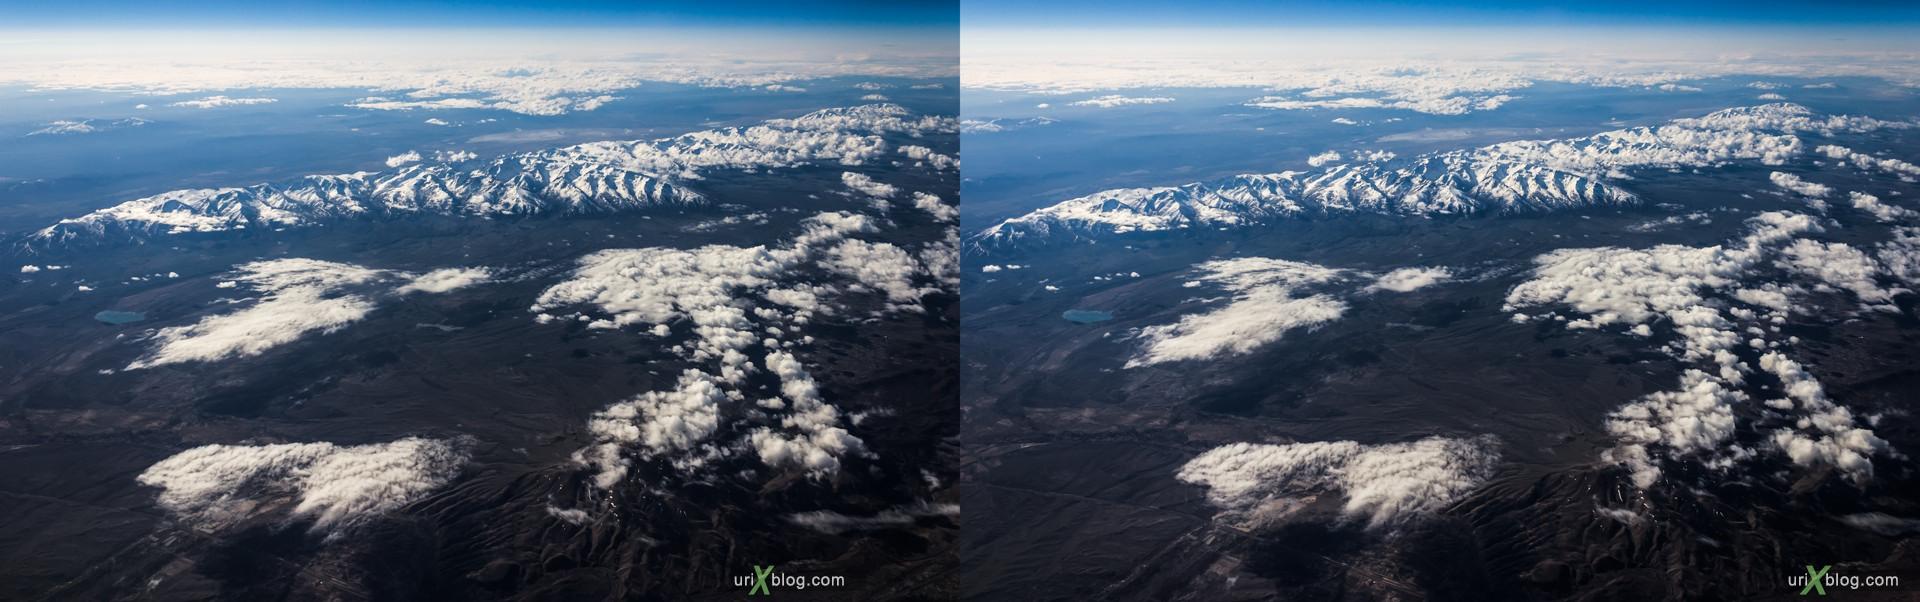 2013, штат Невада, Скалистые горы, США, горы, облака, снег, панорама, самолёт, чёрно-белое, чб, 3D, перекрёстные стереопары, стерео, стереопара, стереопары